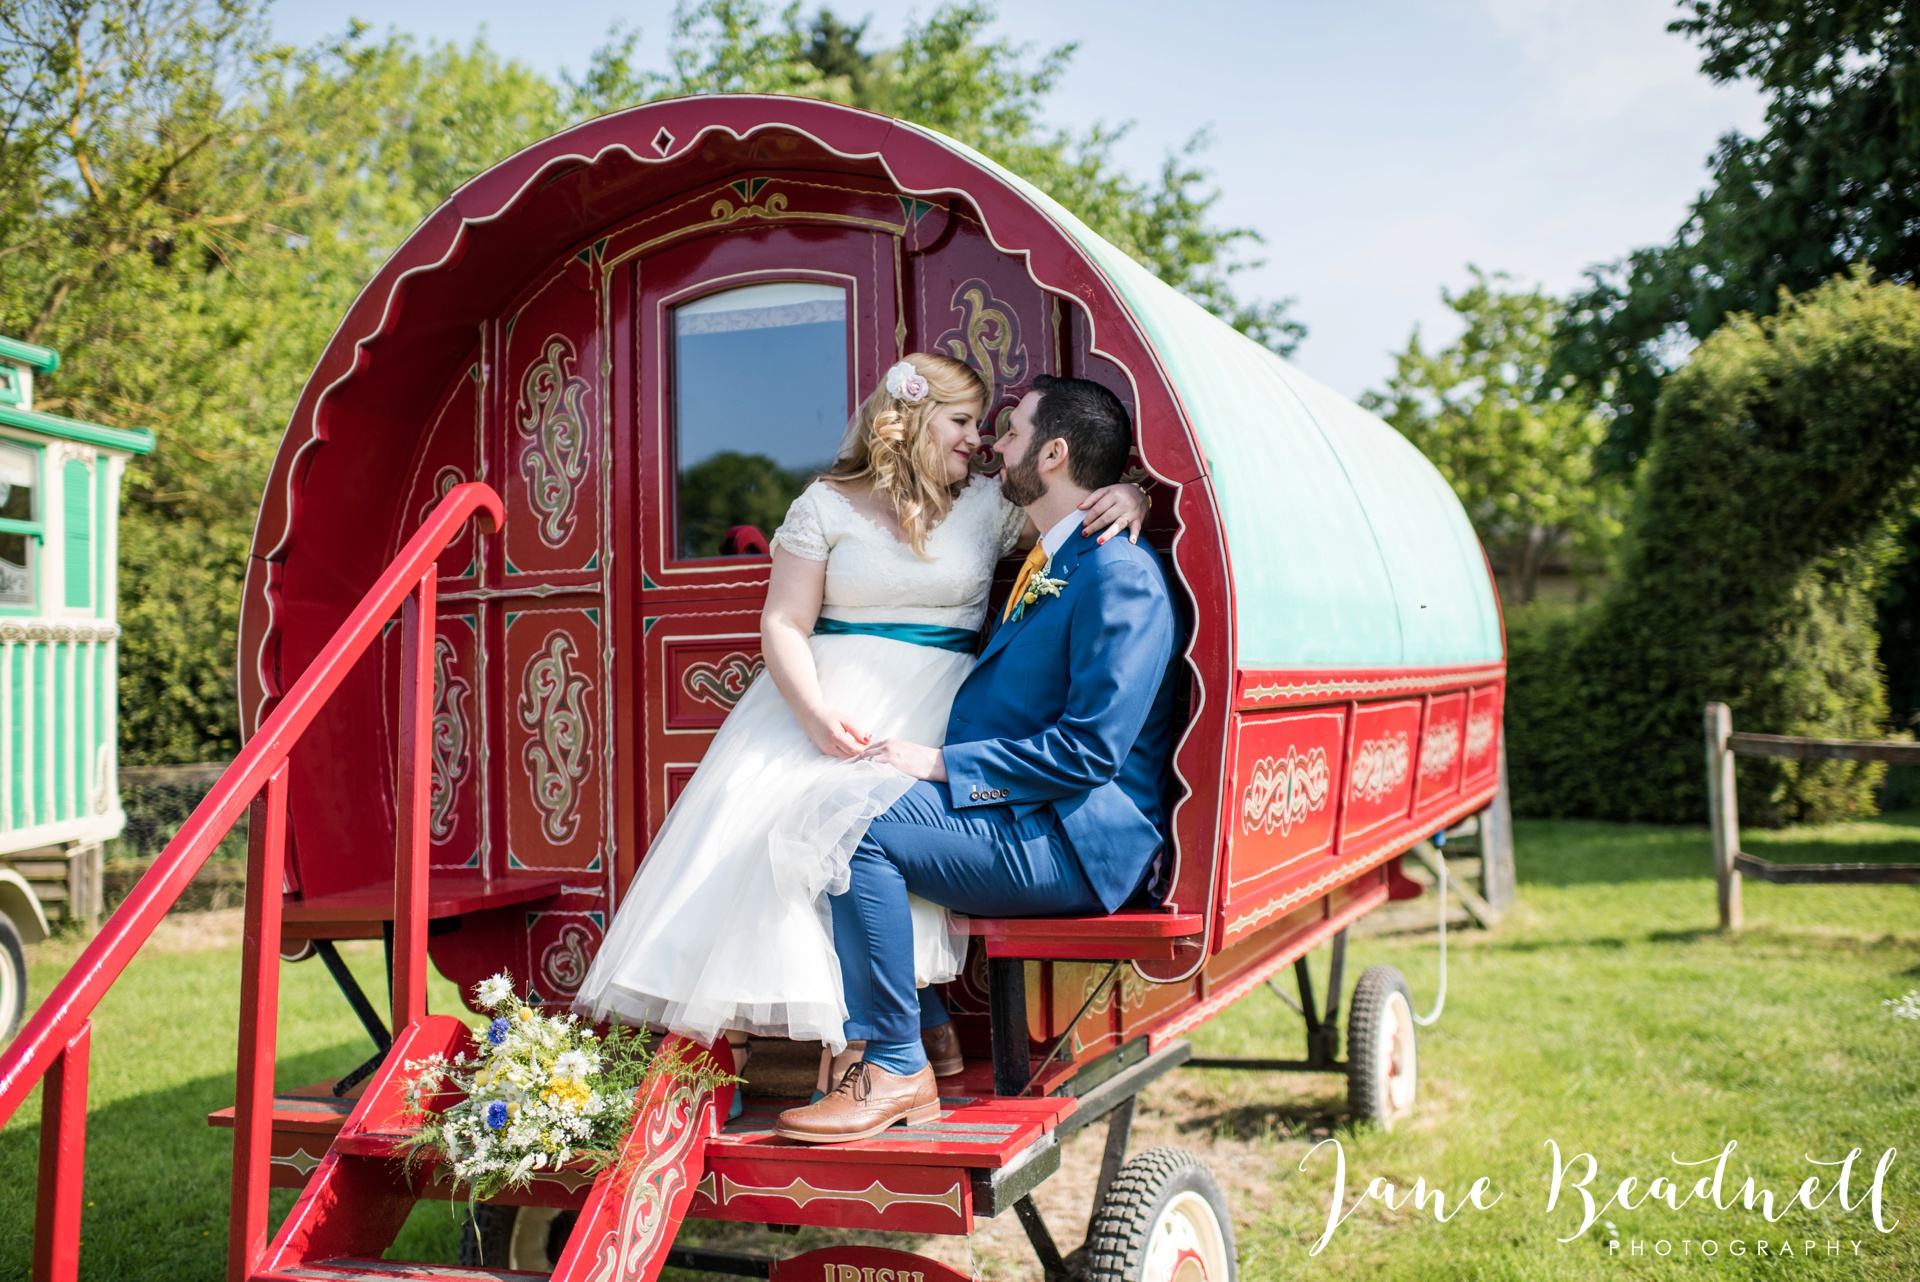 South Farm Wedding photography Hertfordshire by Jane Beadnell Photography fine art wedding photographer_0118